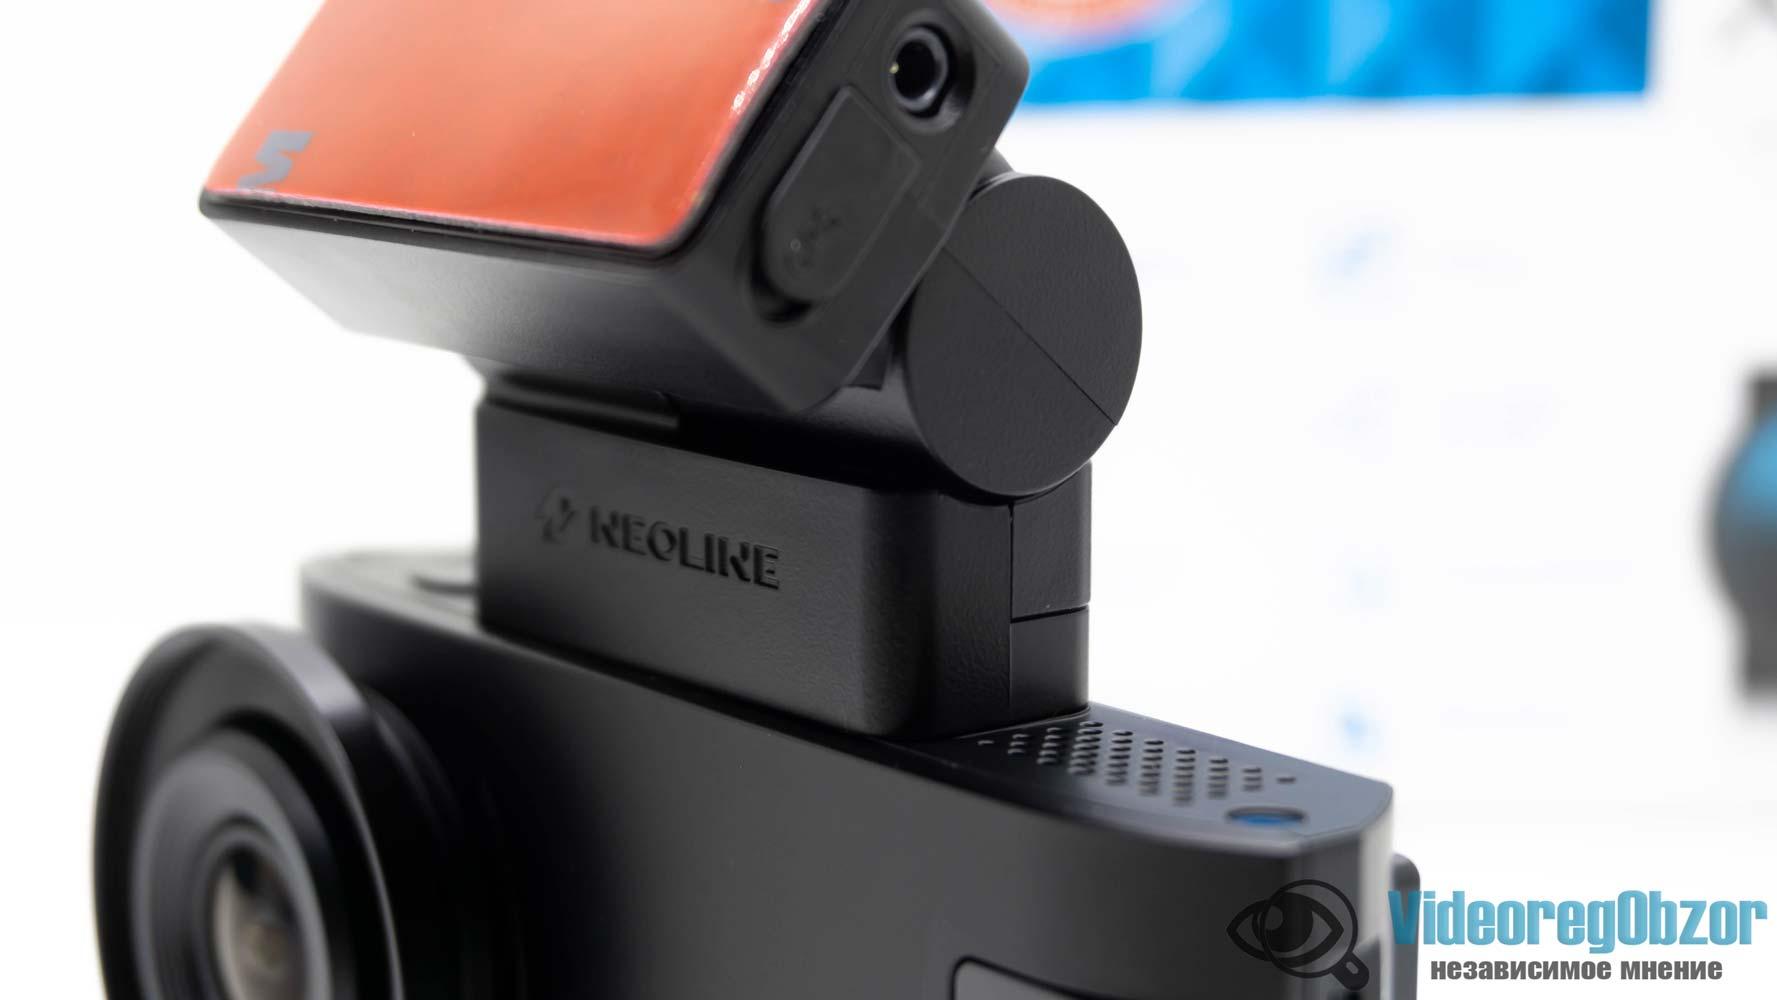 Neoline X COP 9200 обзор 21 VideoregObzor Neoline X-COP 9200: обзор видеорегистратора с радар-детектором